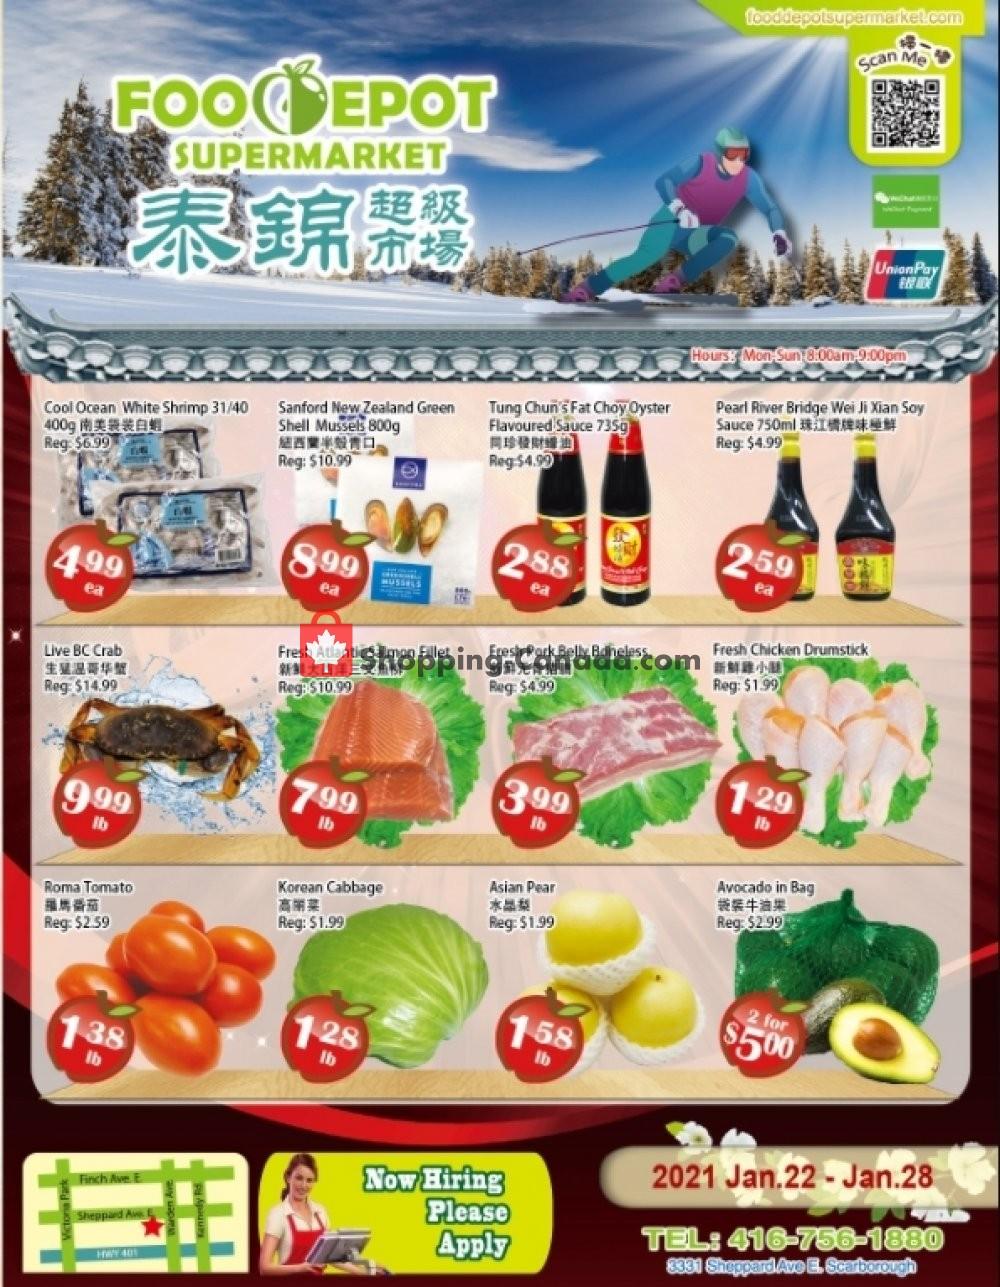 Flyer Food Depot Supermarket Canada - from Friday January 22, 2021 to Thursday January 28, 2021